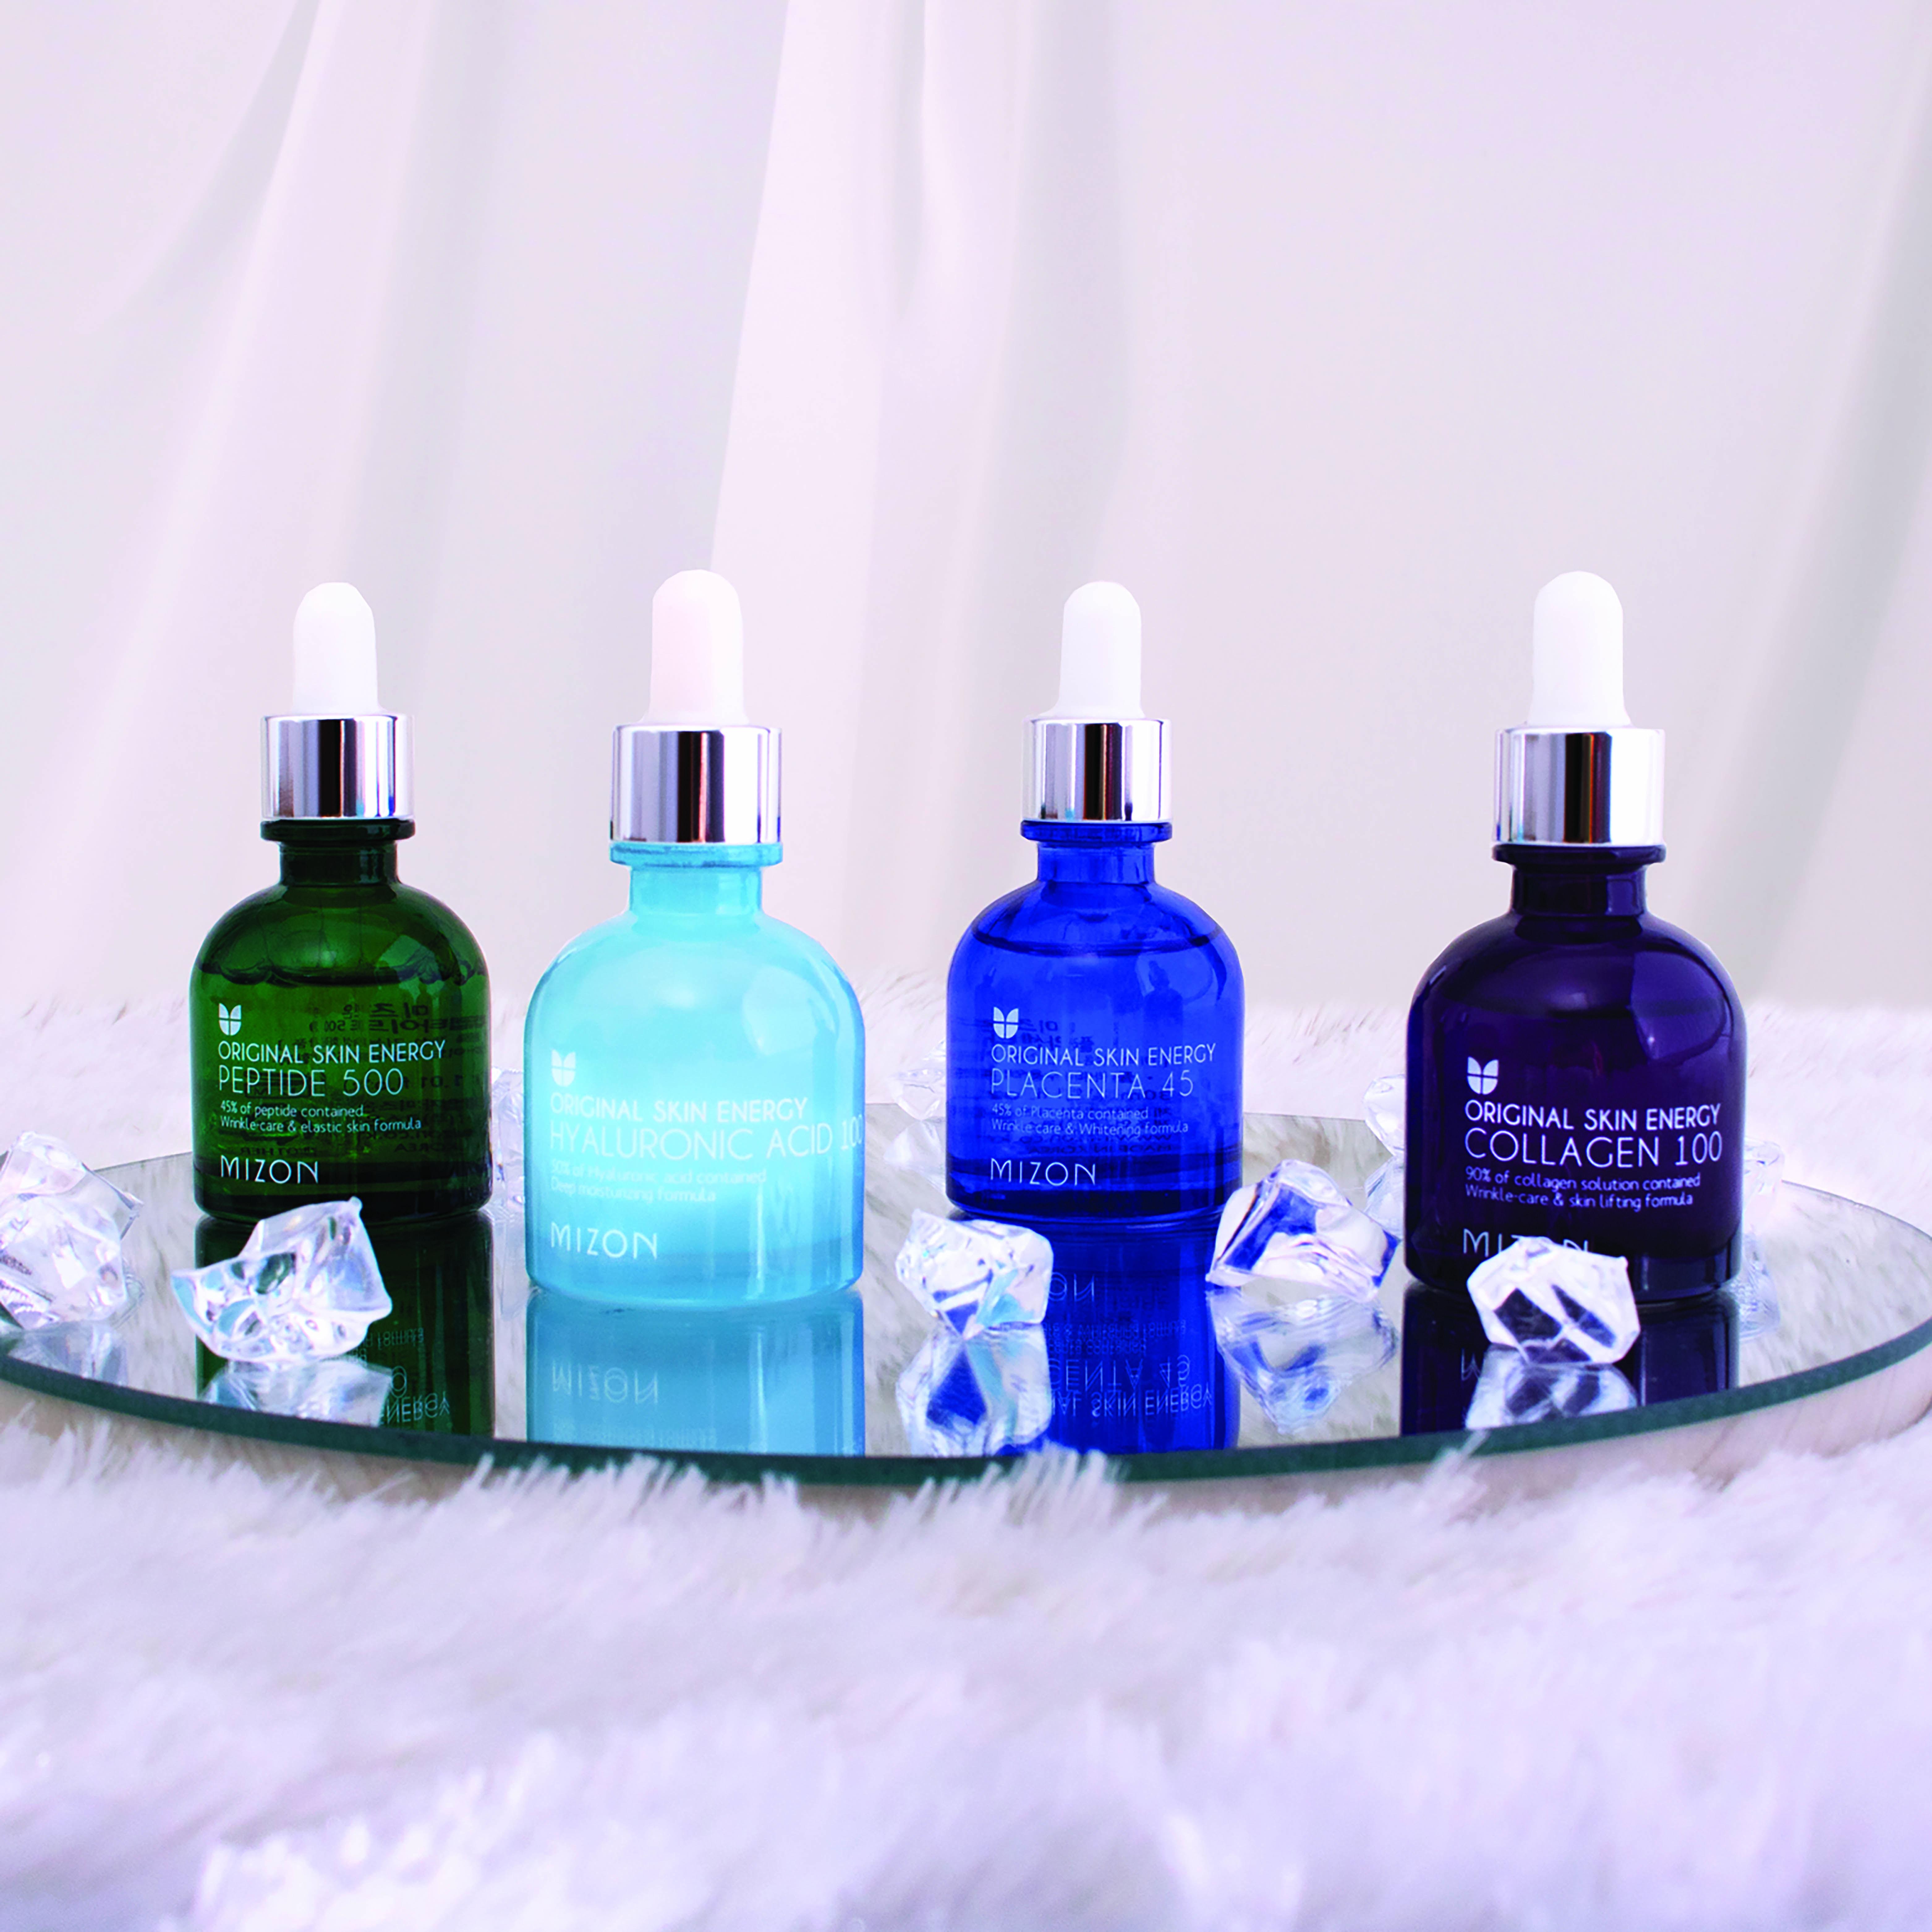 Glass skin essentials exfoliator, gel cream and vitamin